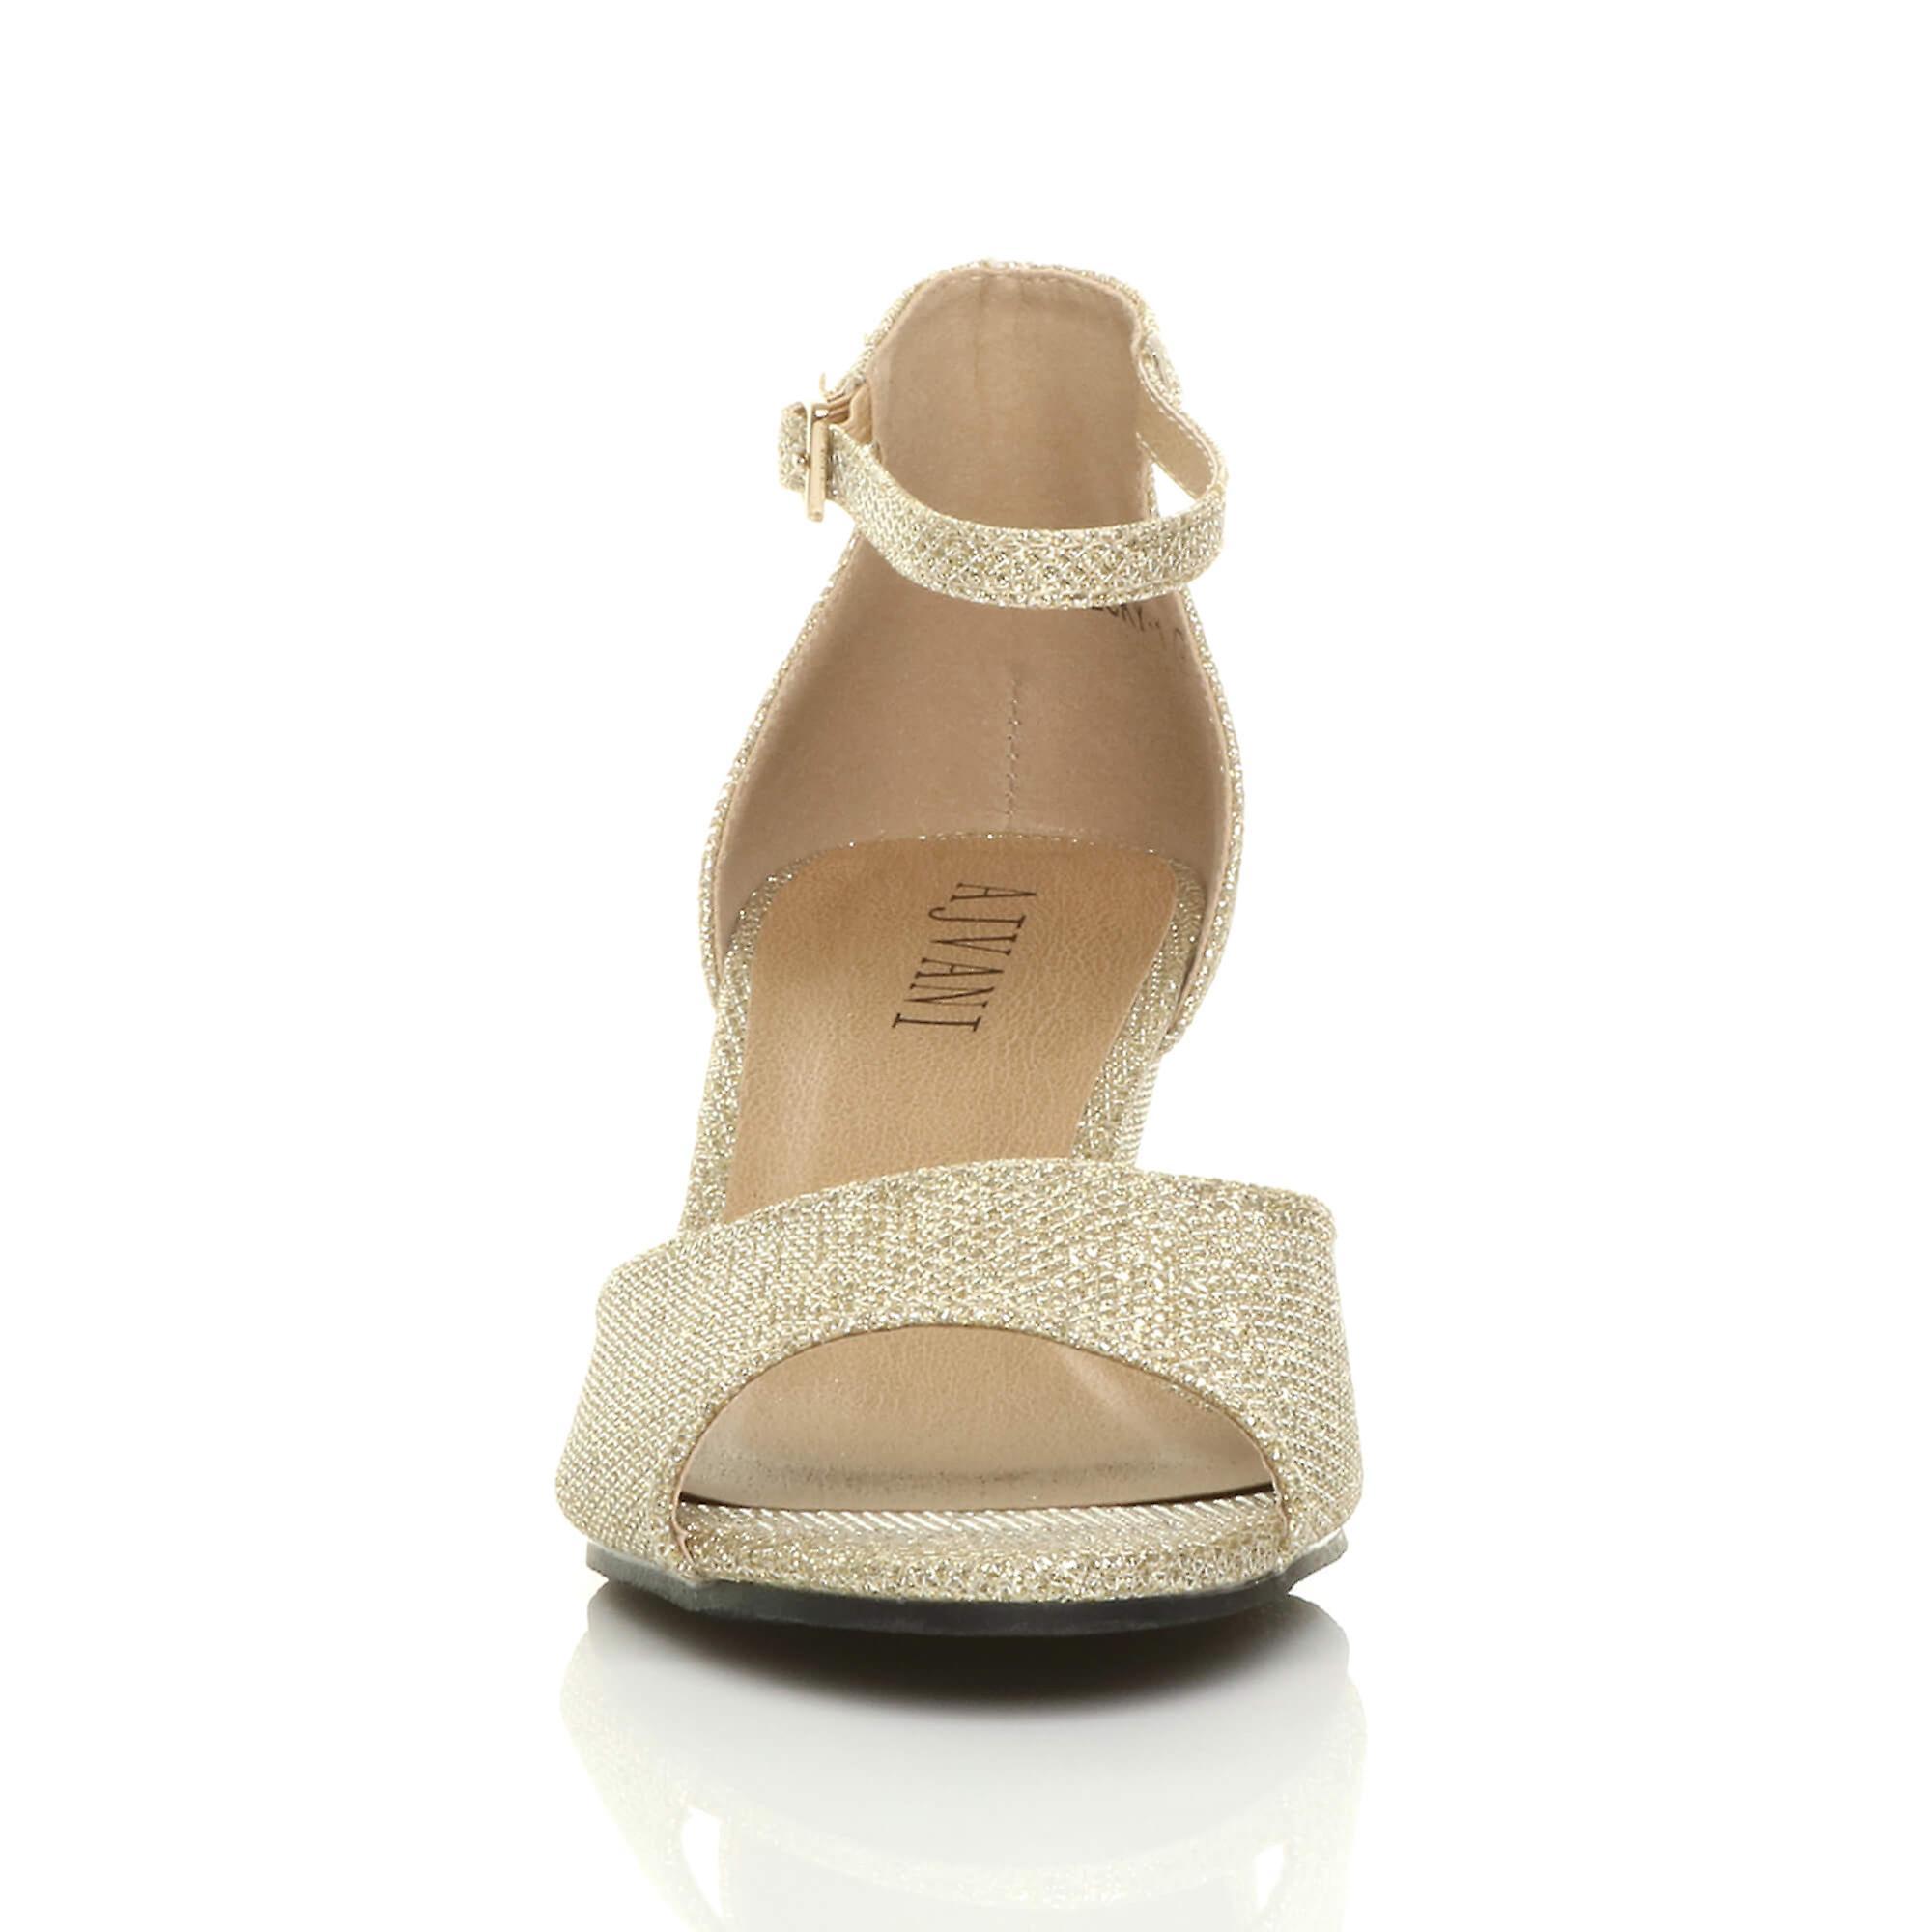 peep strap smart womens casual evening heel mid Ajvani wedge ankle low sandals toe XBqRwwAn